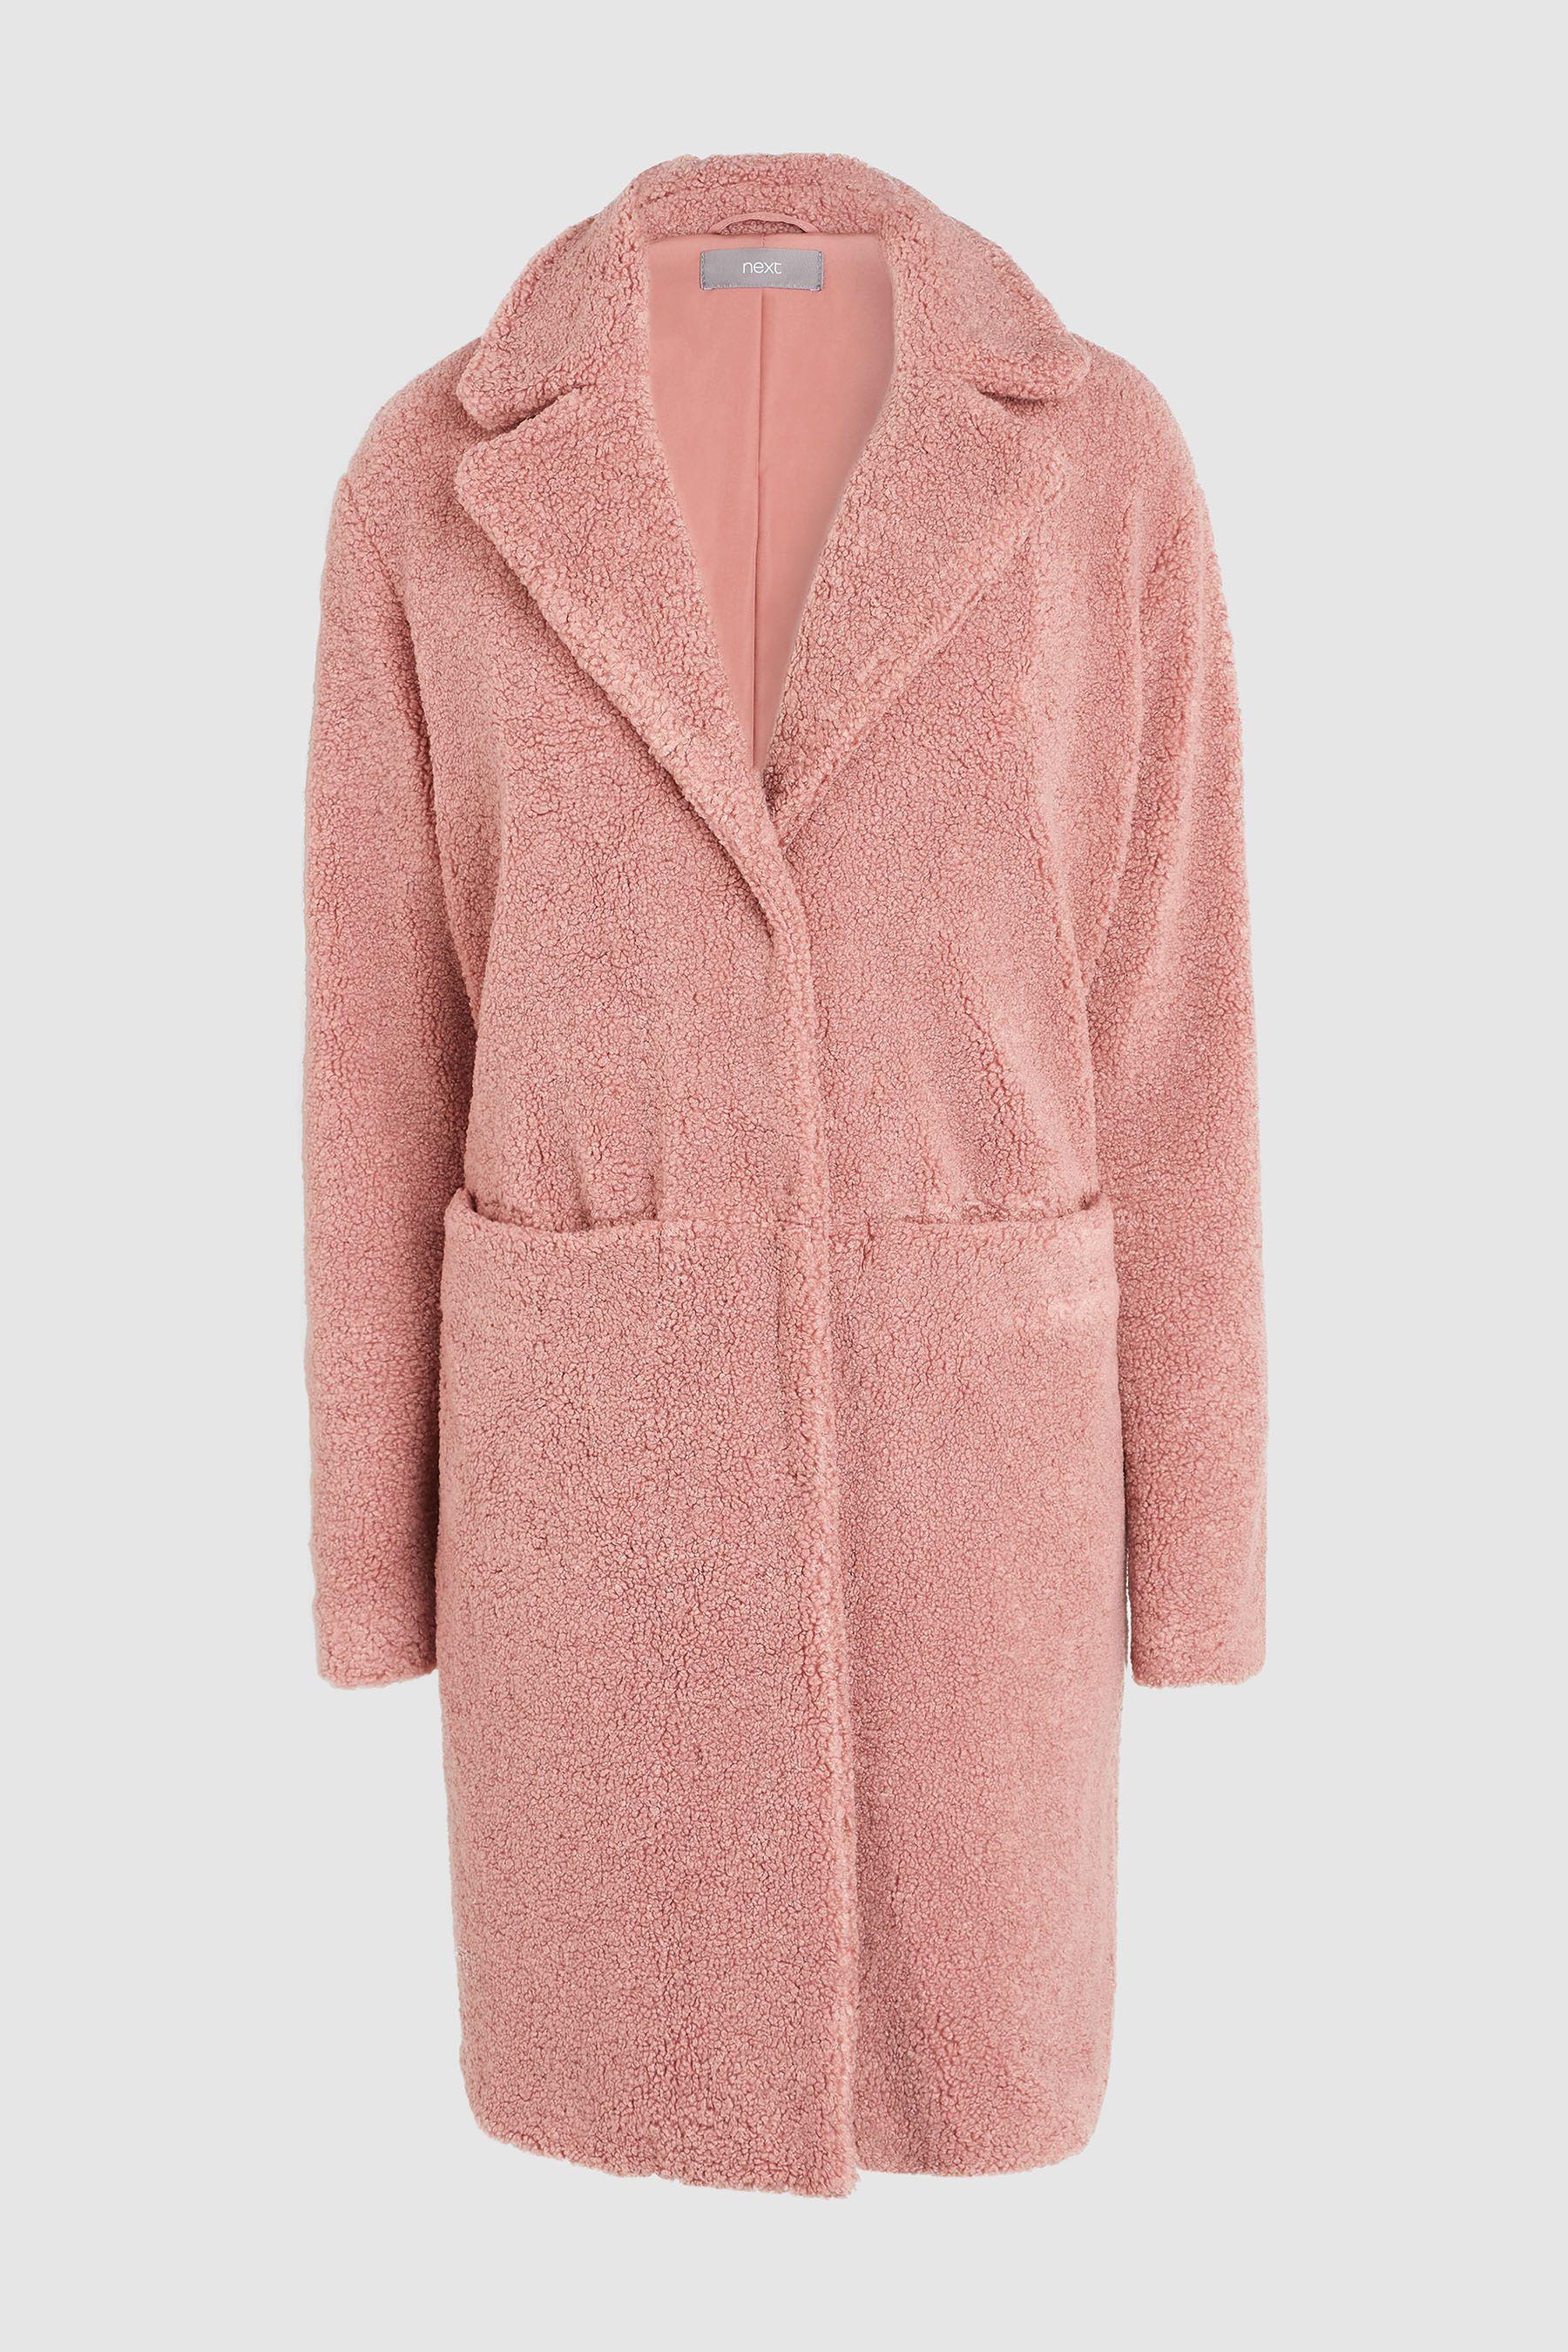 c52c0f2328a7b Womens Next Pink Long Teddy Borg Jacket - Pink. Buy Long Teddy Borg Jacket  from the Next UK online shop ...